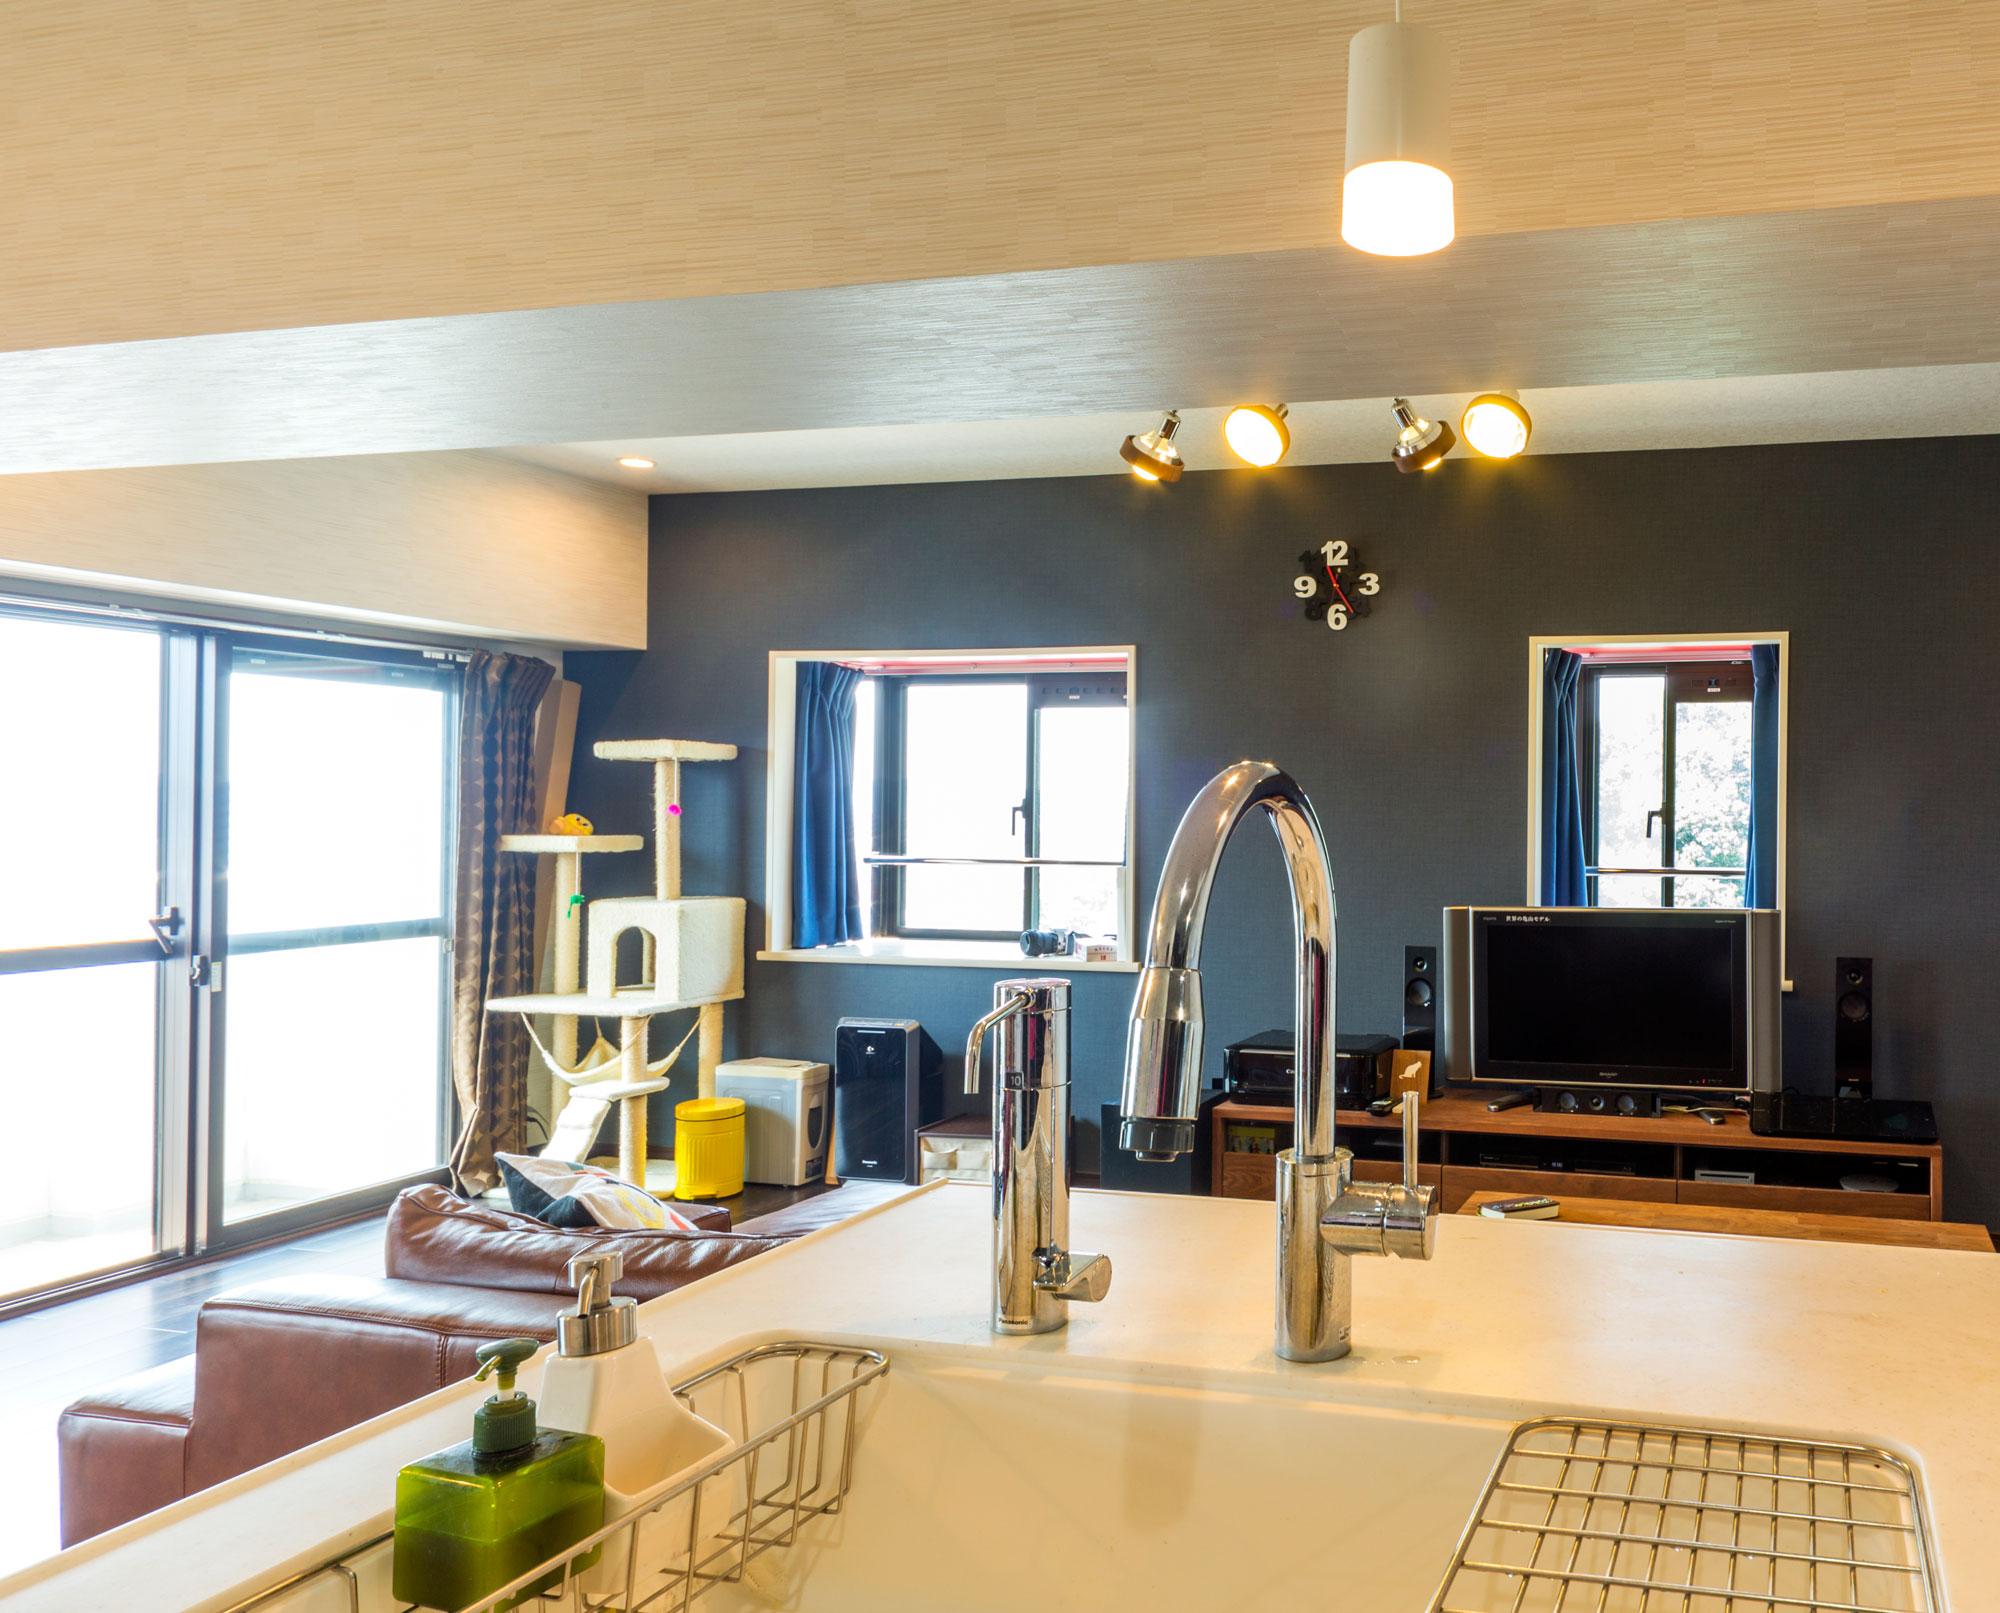 LDの壁クロスとシステムキッチンの建具は色味を合わせて統一感を演出。